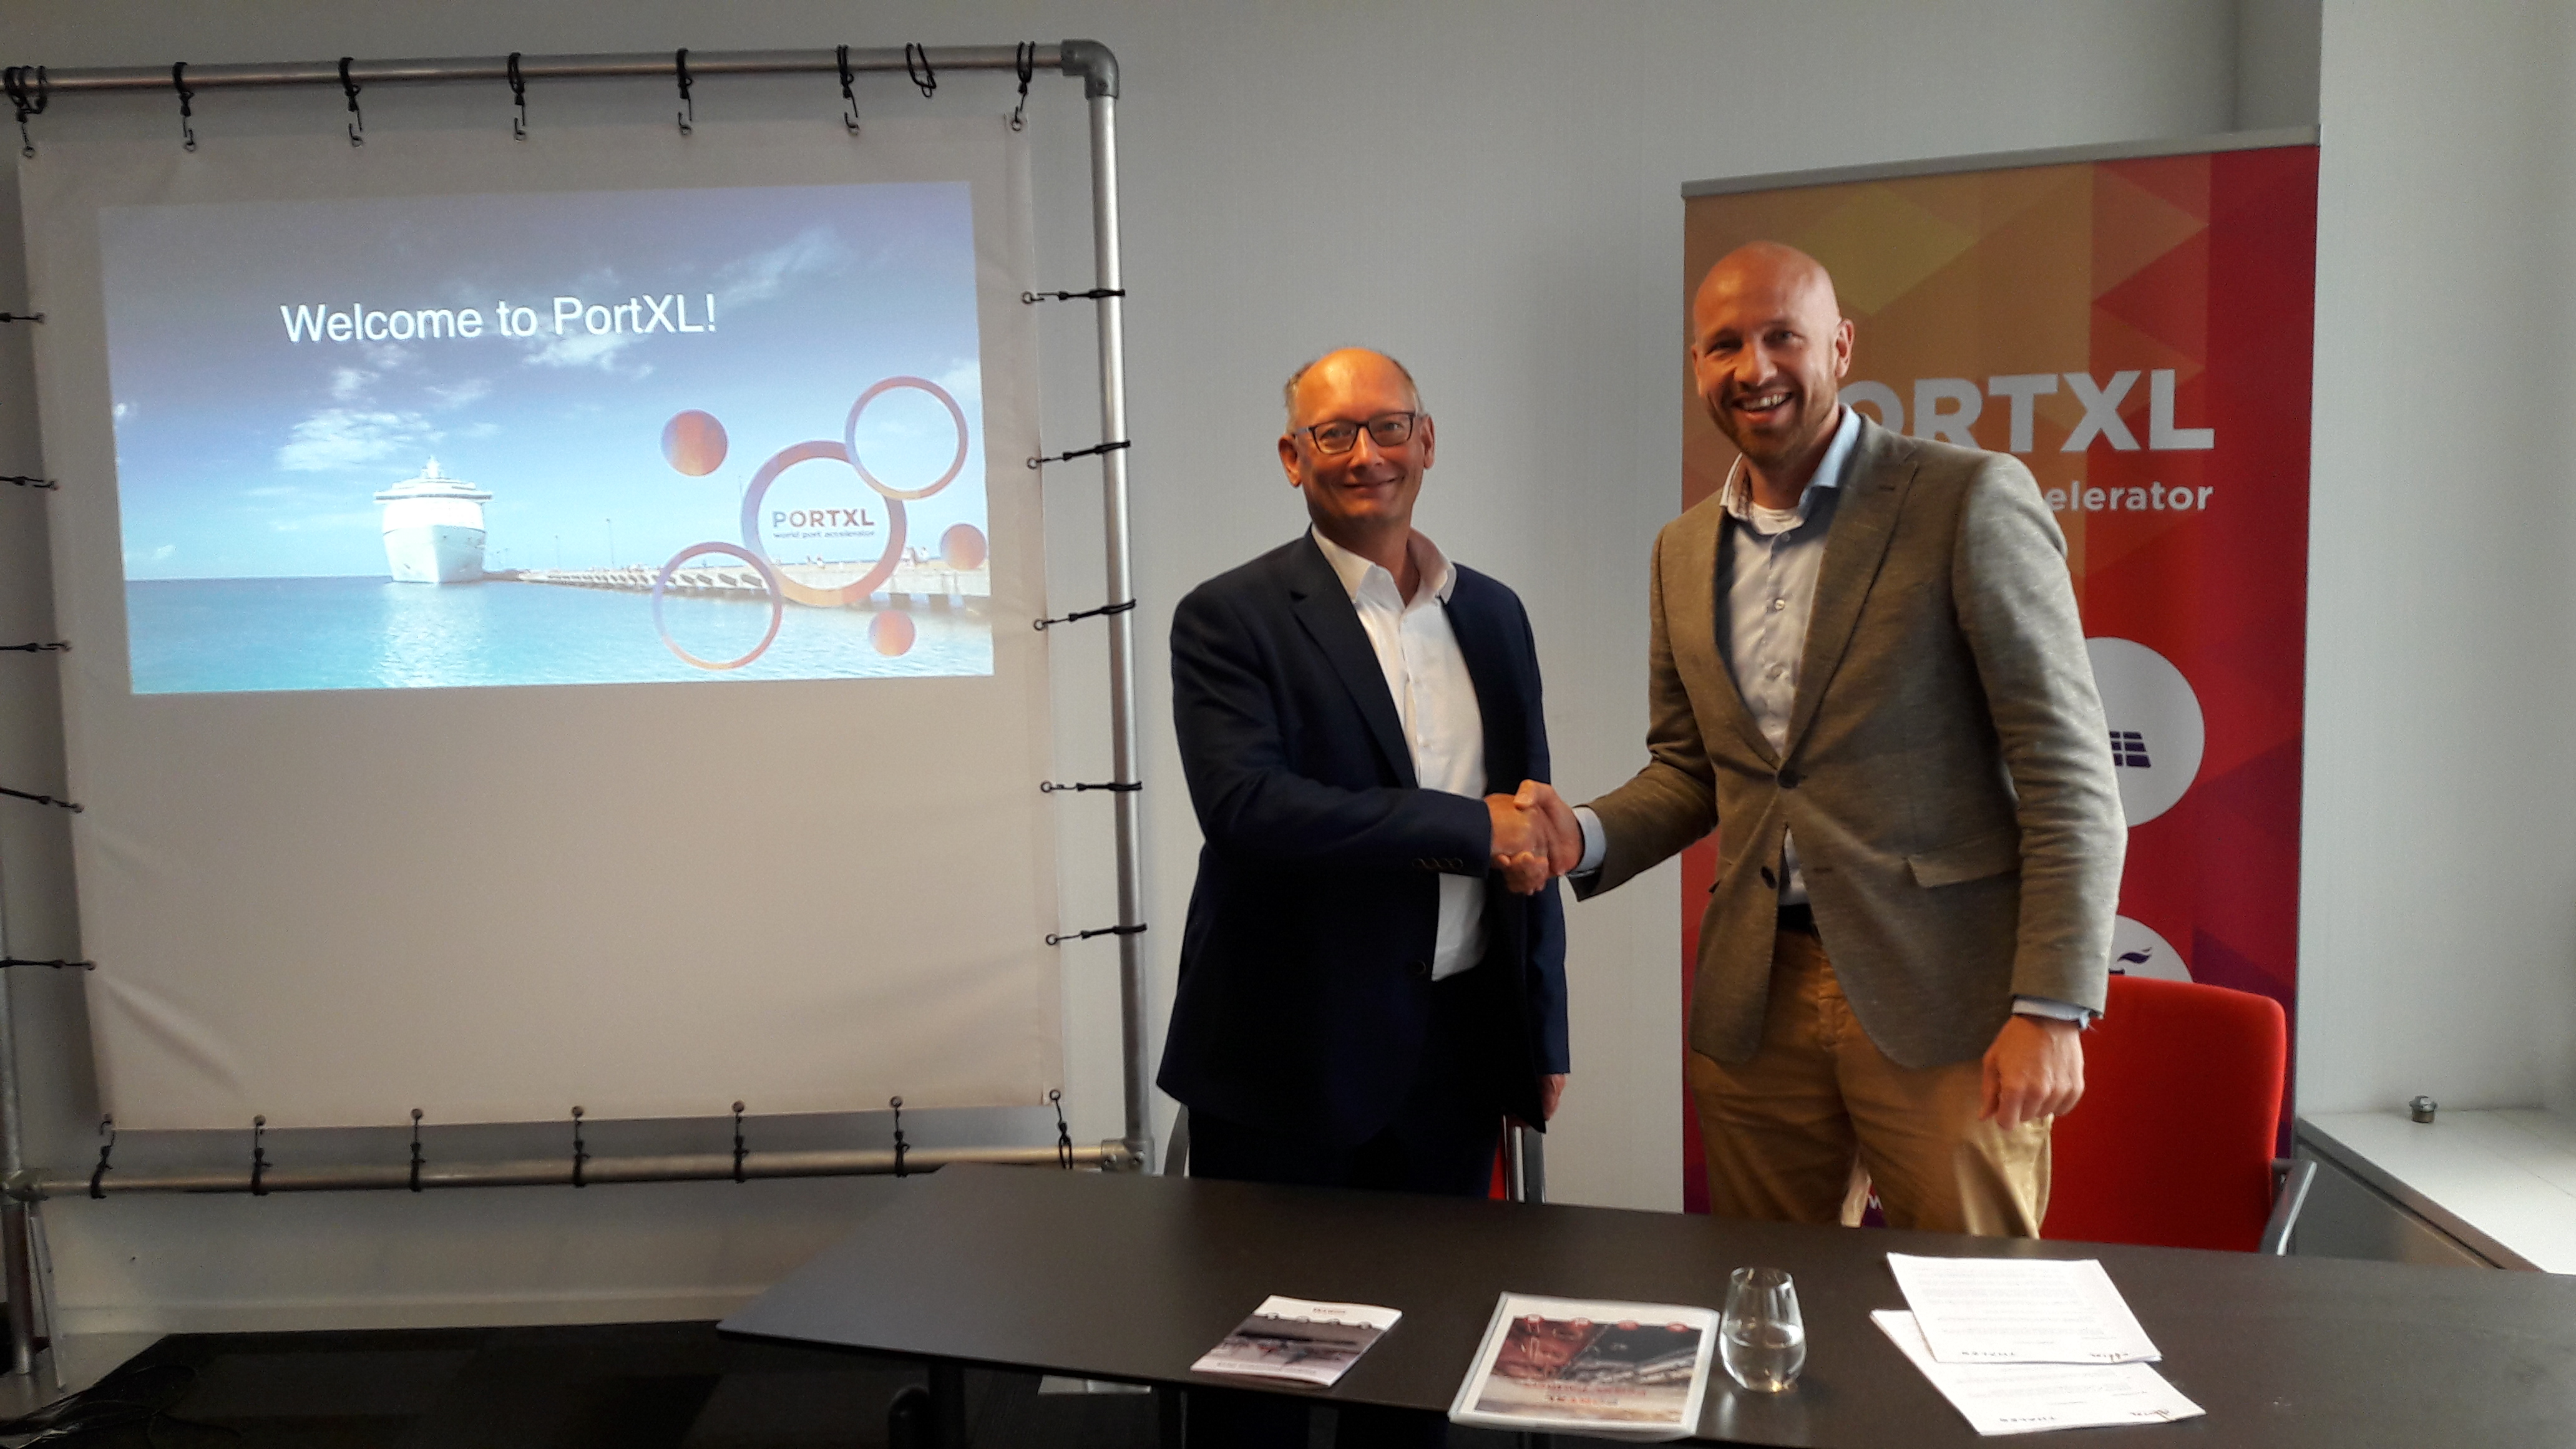 Op 4 september ondertekenden Lukas Roffel (CTO Thales) en Mare Straetmans (Managing Director PortXL)